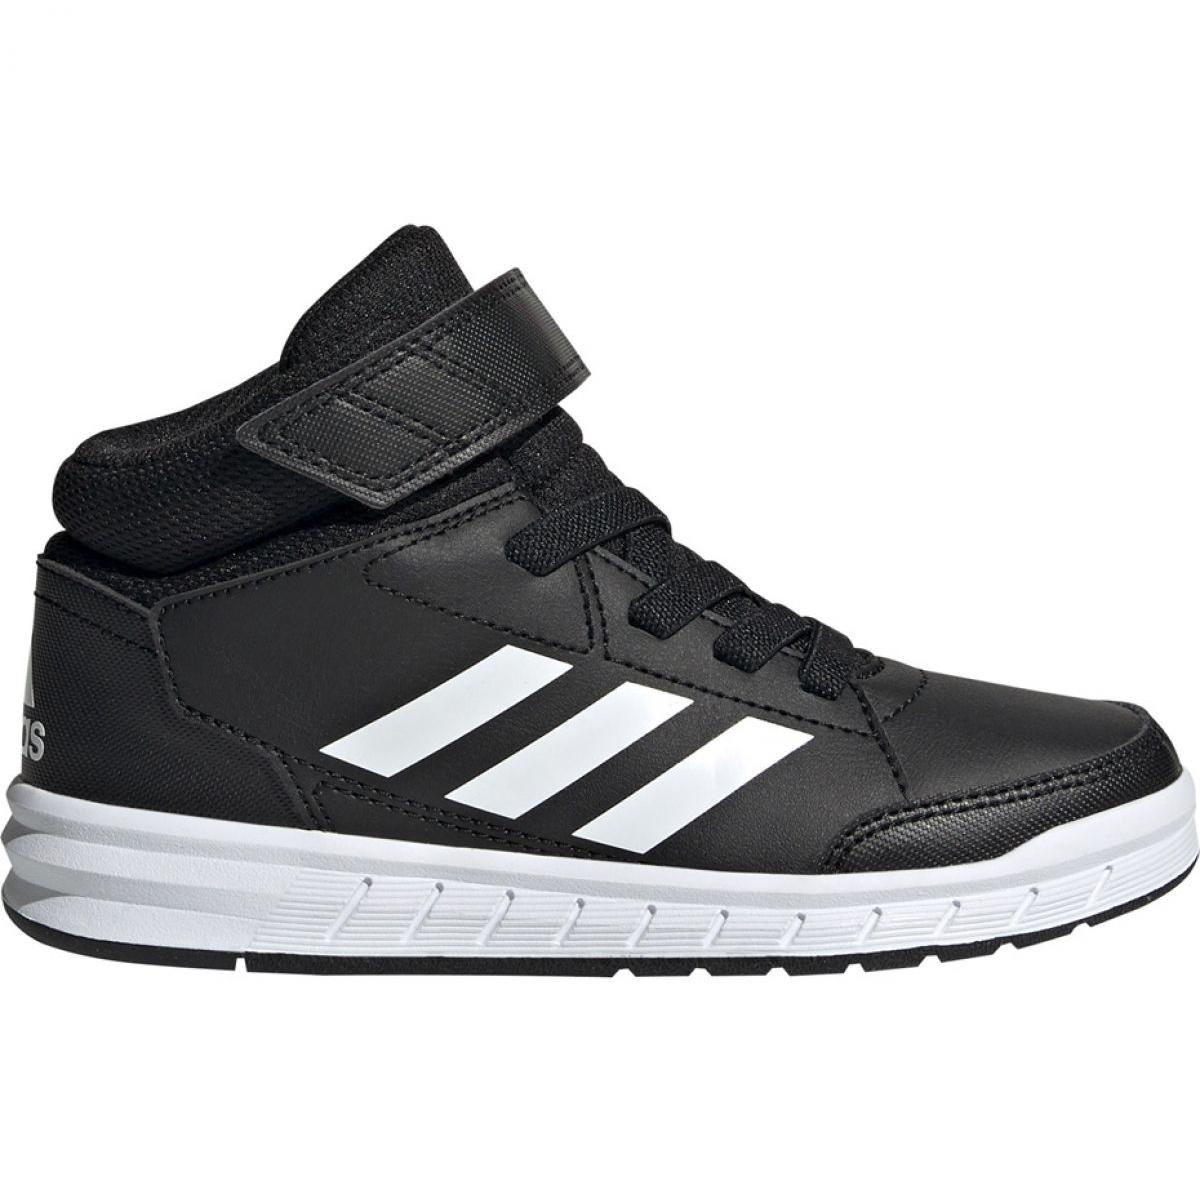 Mid Schuhe G27113 Adidas Altasport K Schwarz Jr OPkuiTXZ